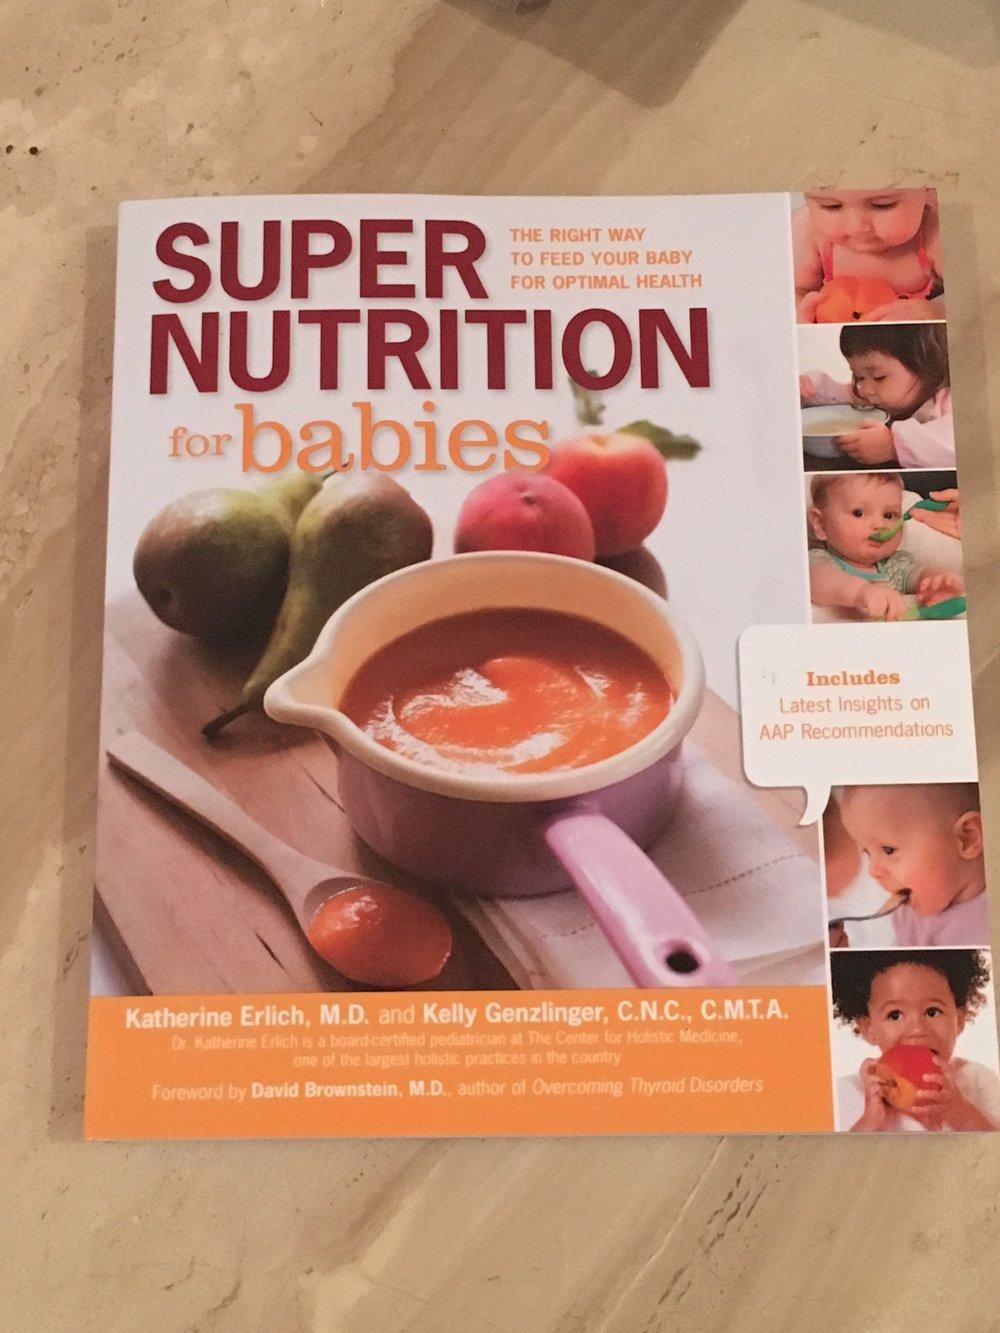 Super Nutrition for babies book erlich genzlinger holistic stephcuesta